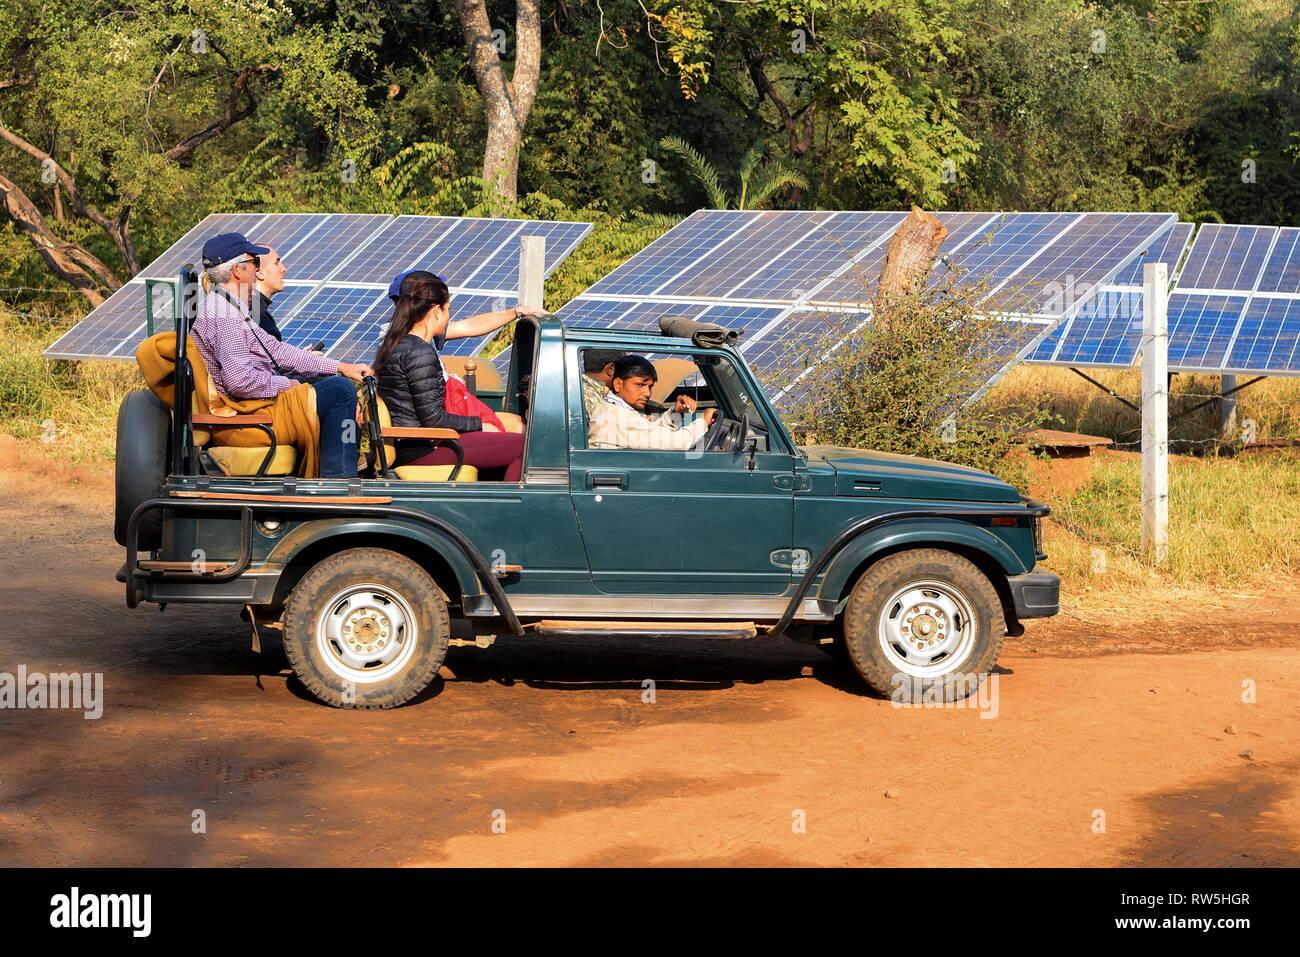 JAIPUR, INDIA - 9 NOVEMBER 2017: Tourists sit in safari truck in Ranthambore - Stock Image